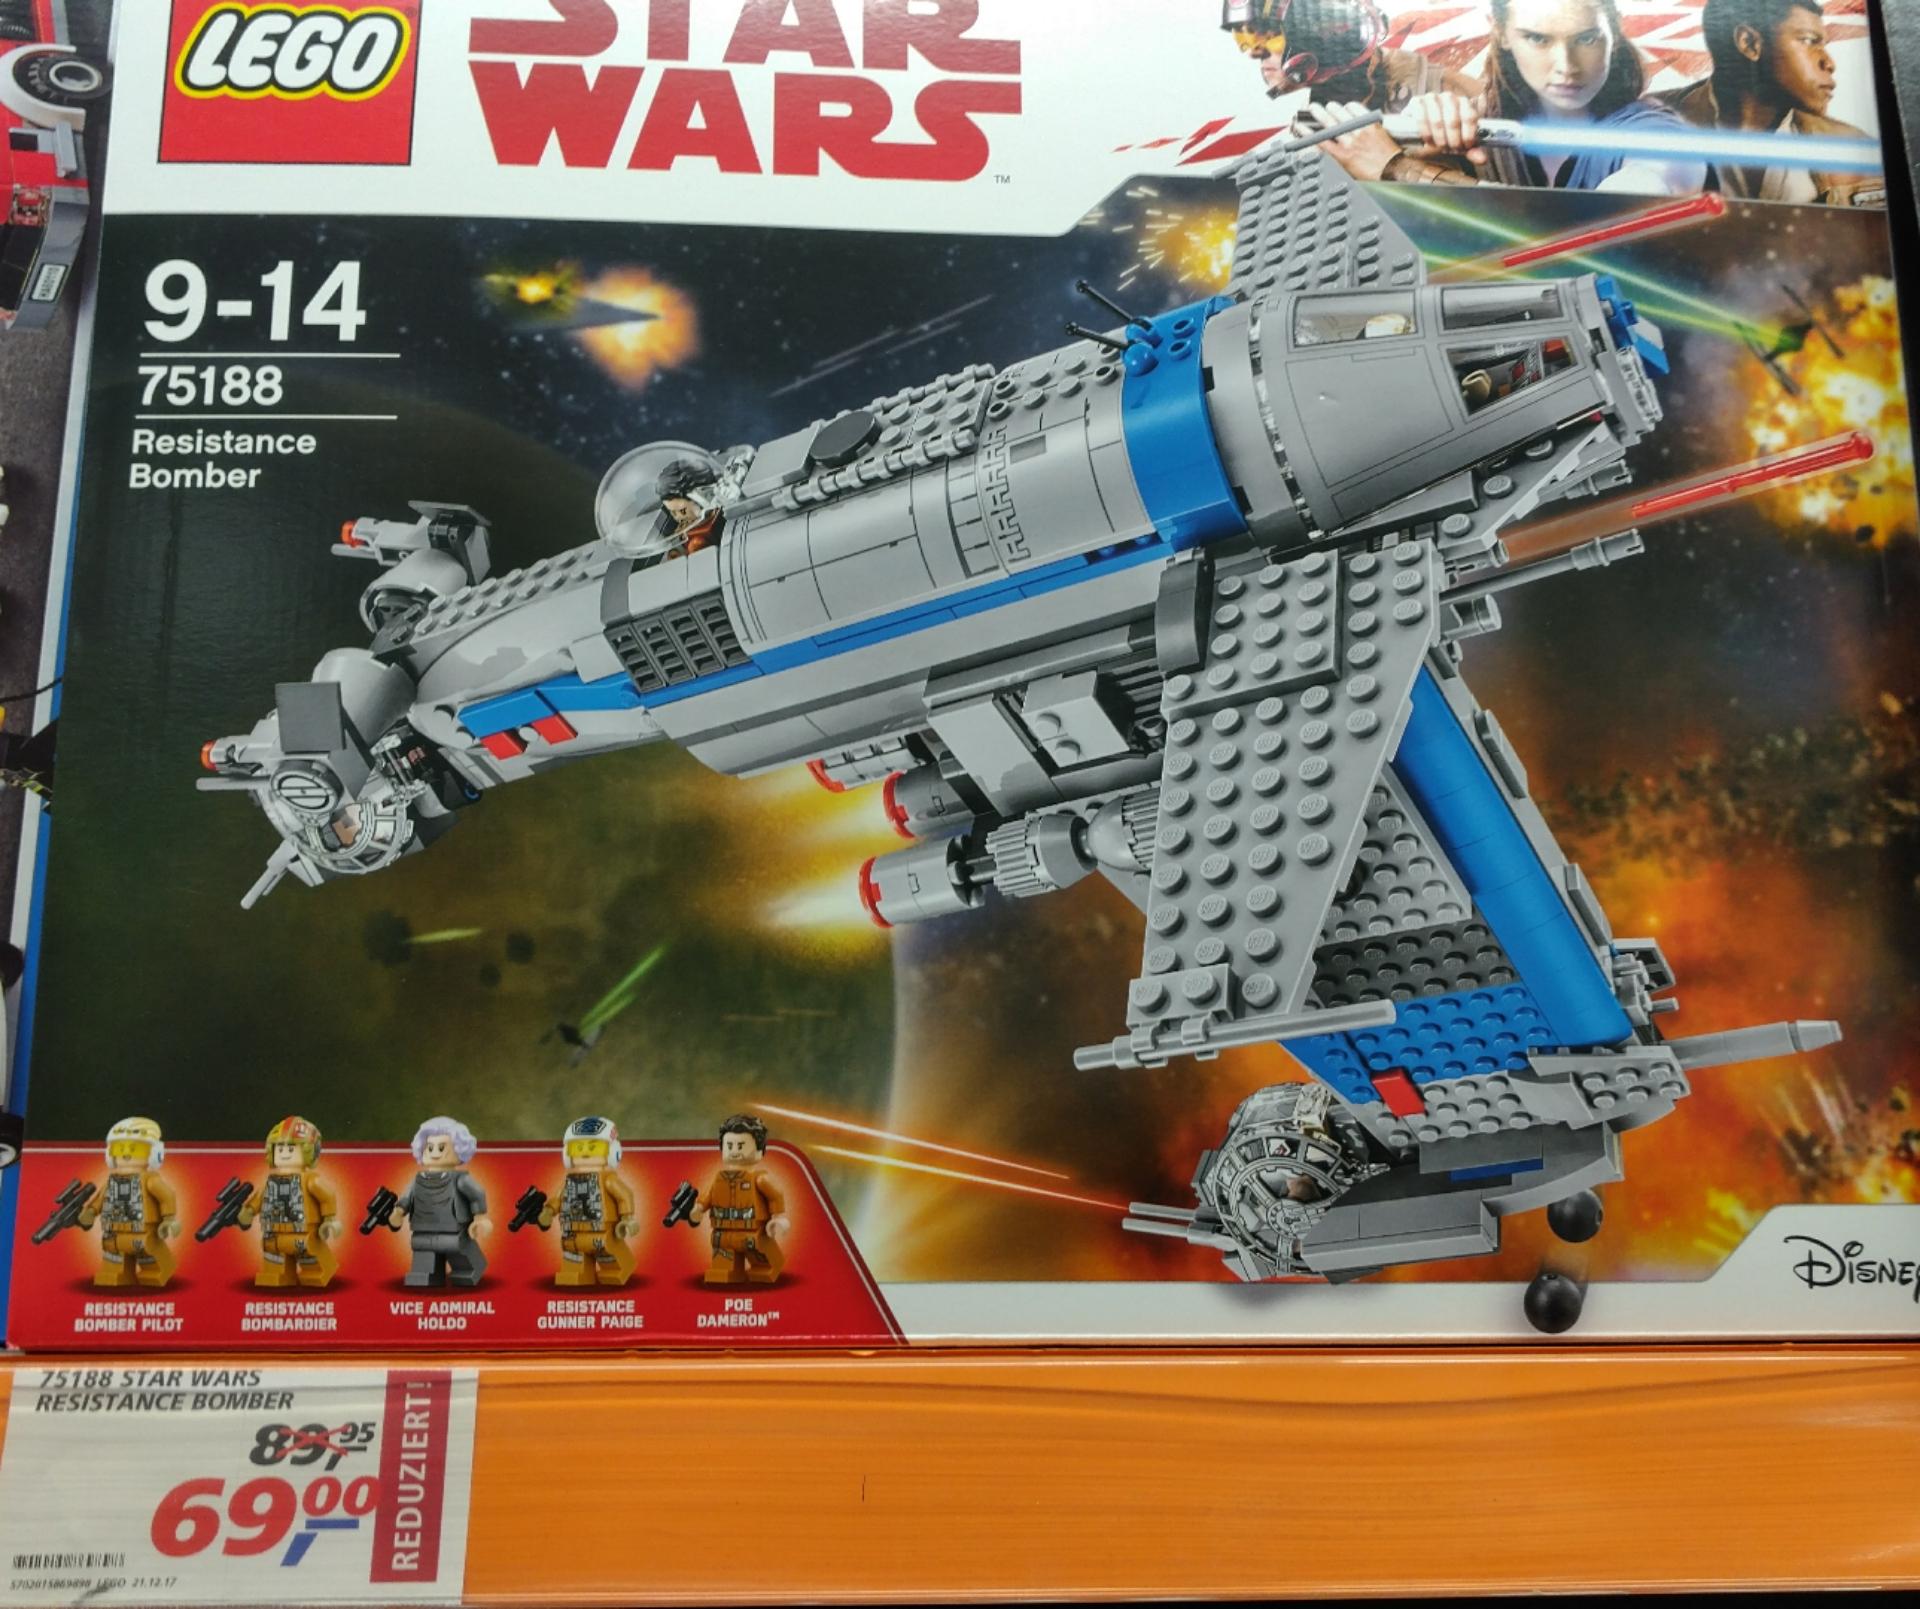 LEGO Star Wars Resistance Bomber 75188 und Lego Star Wars 75187 BB-8 [Real Berlin-Neukölln]